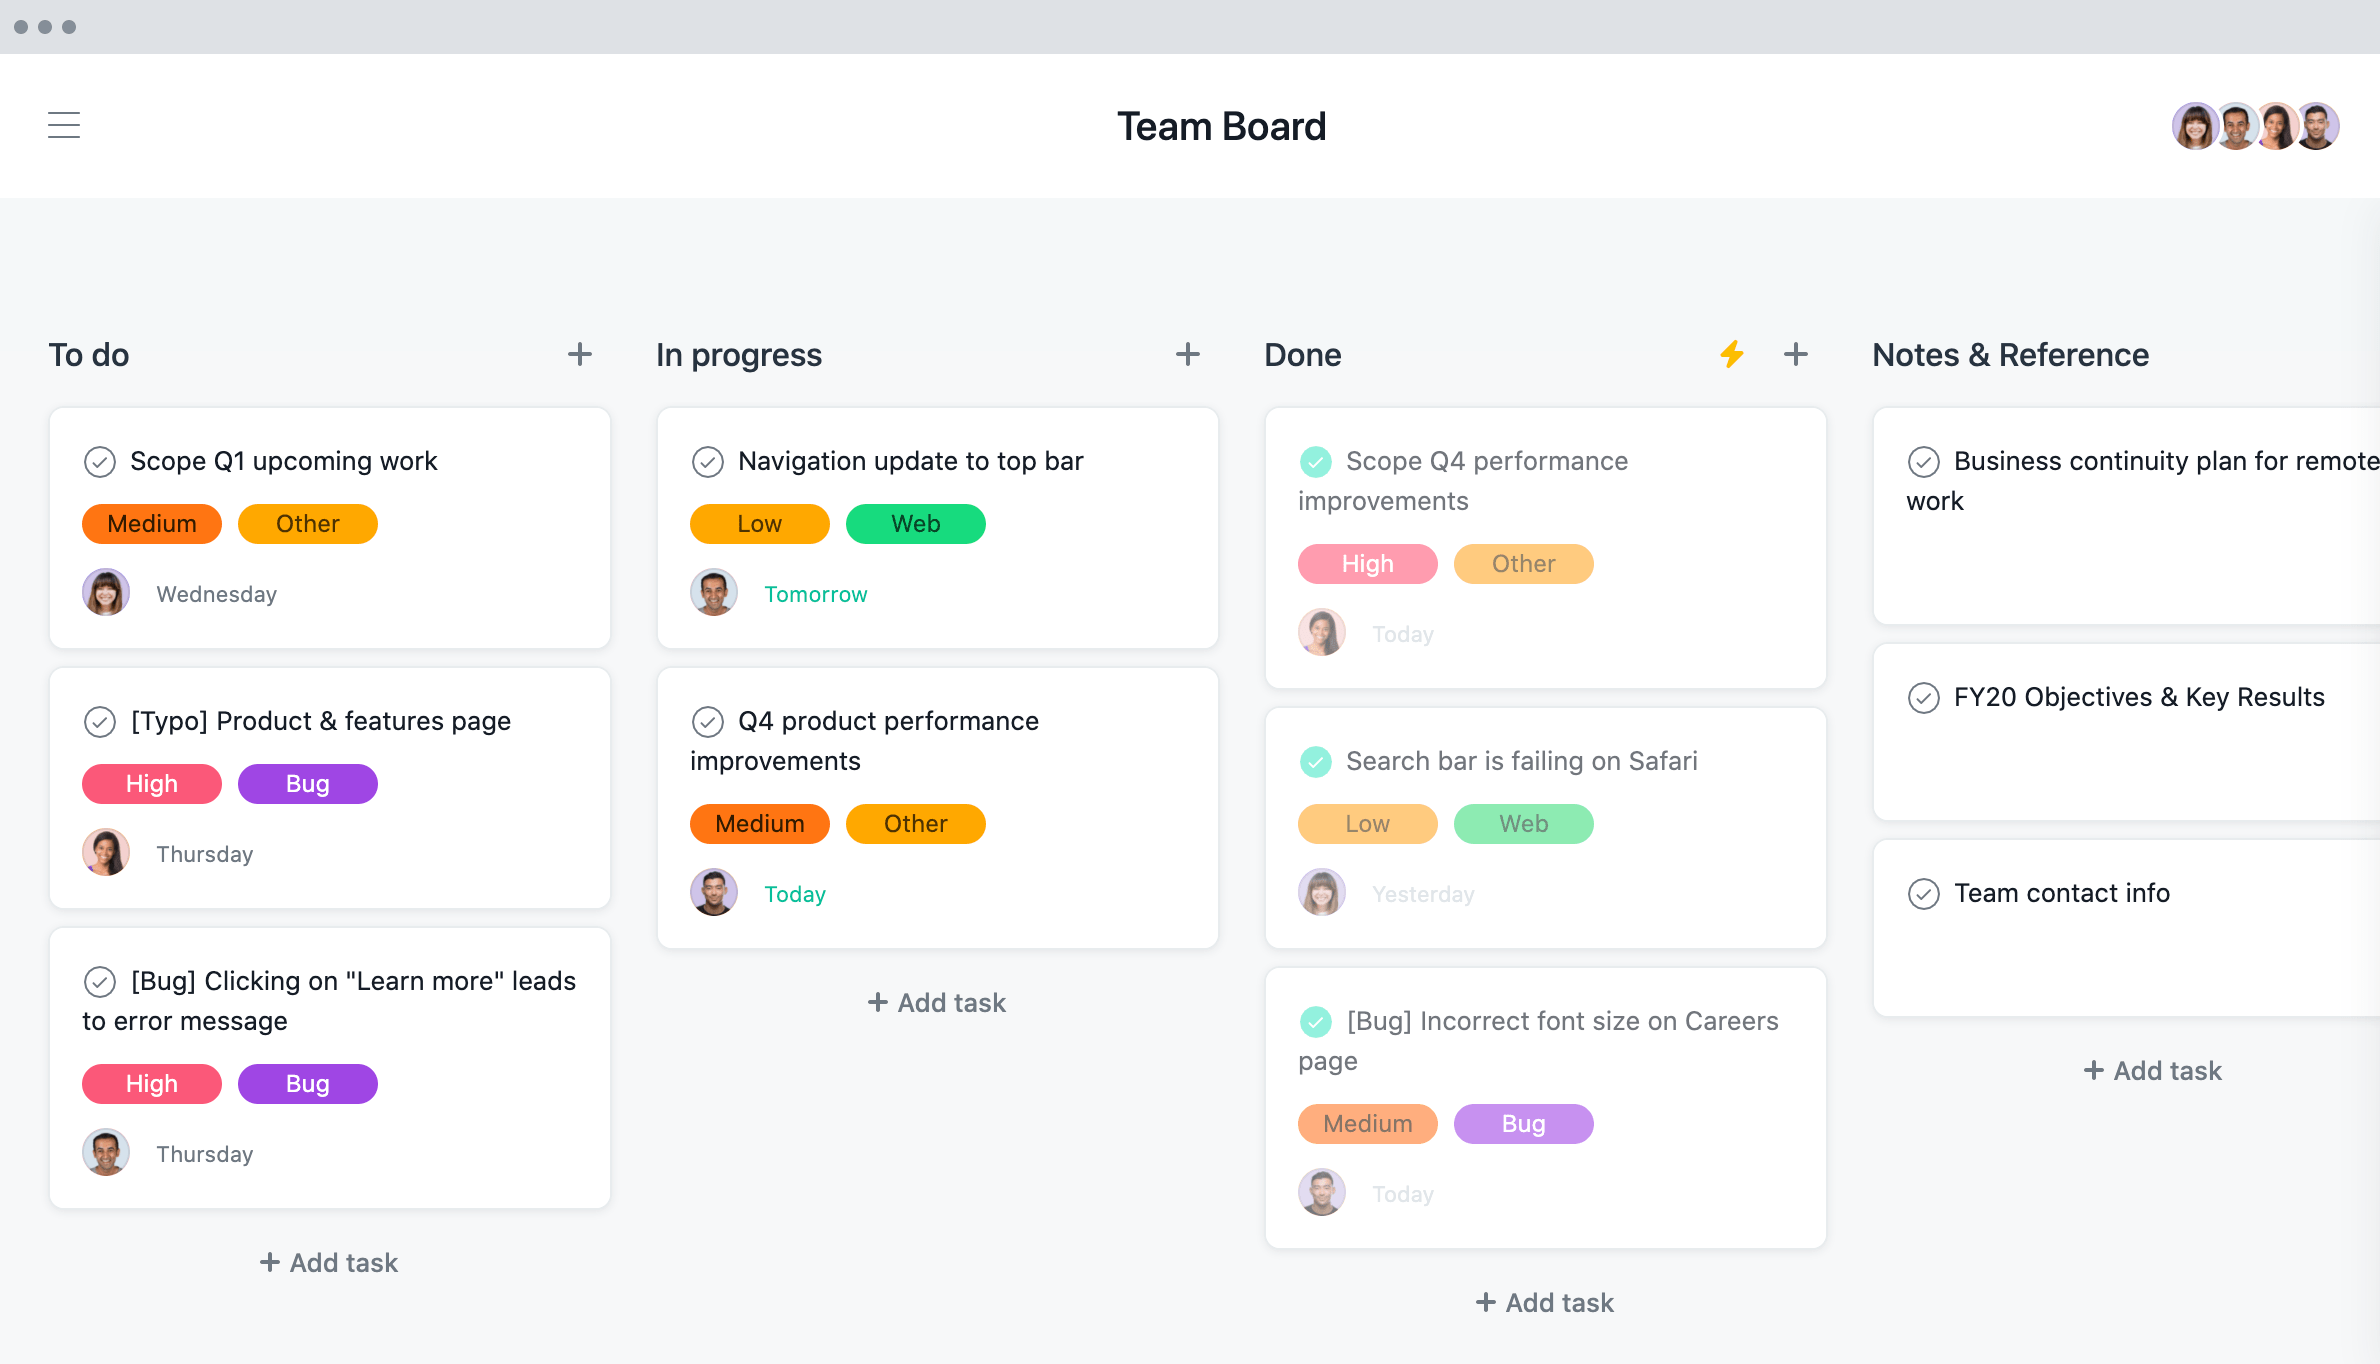 Asana 온라인 프로젝트 관리 소프트웨어는 팀을 위한 할 일 목록을 만듭니다